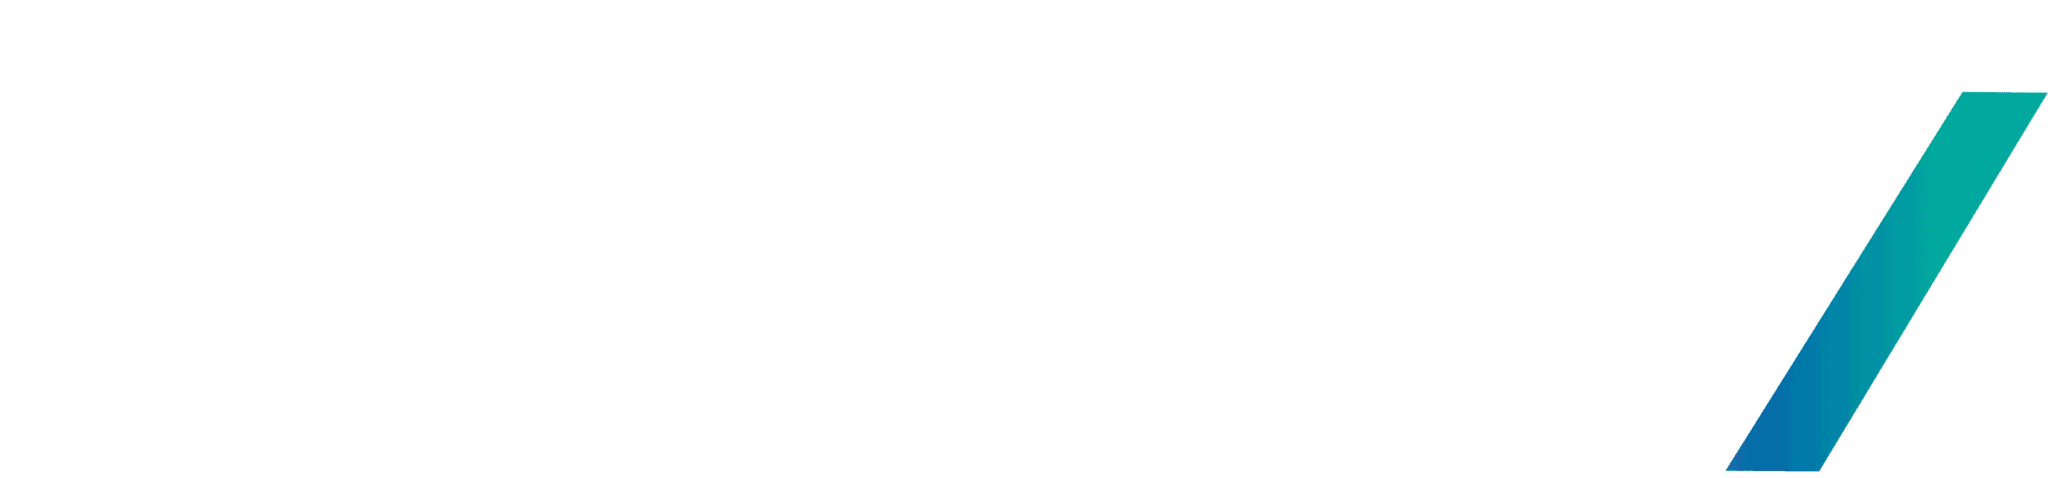 Advizex2020headerlogo-2048×478